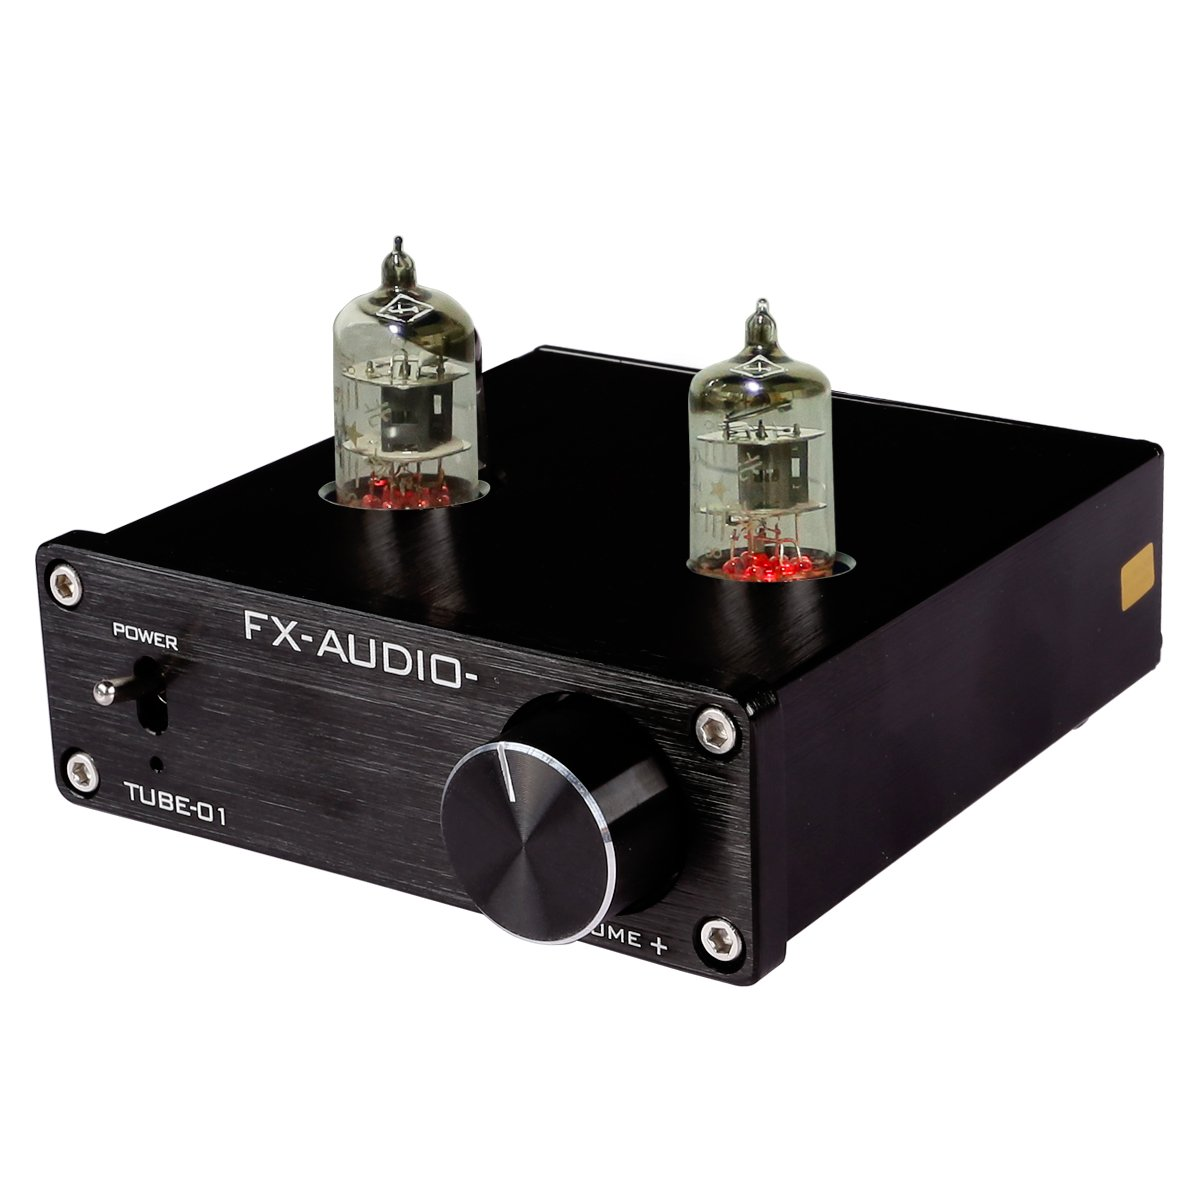 Leaning Tech Black joue rnow FX Tube de 01Pre Amplifier Hi-Fi estéreo de búfer de preamplificador, con mini 6j1Válvula & vacío Tube, 12V, color negro JouerNow MINI 6J1 BLACK